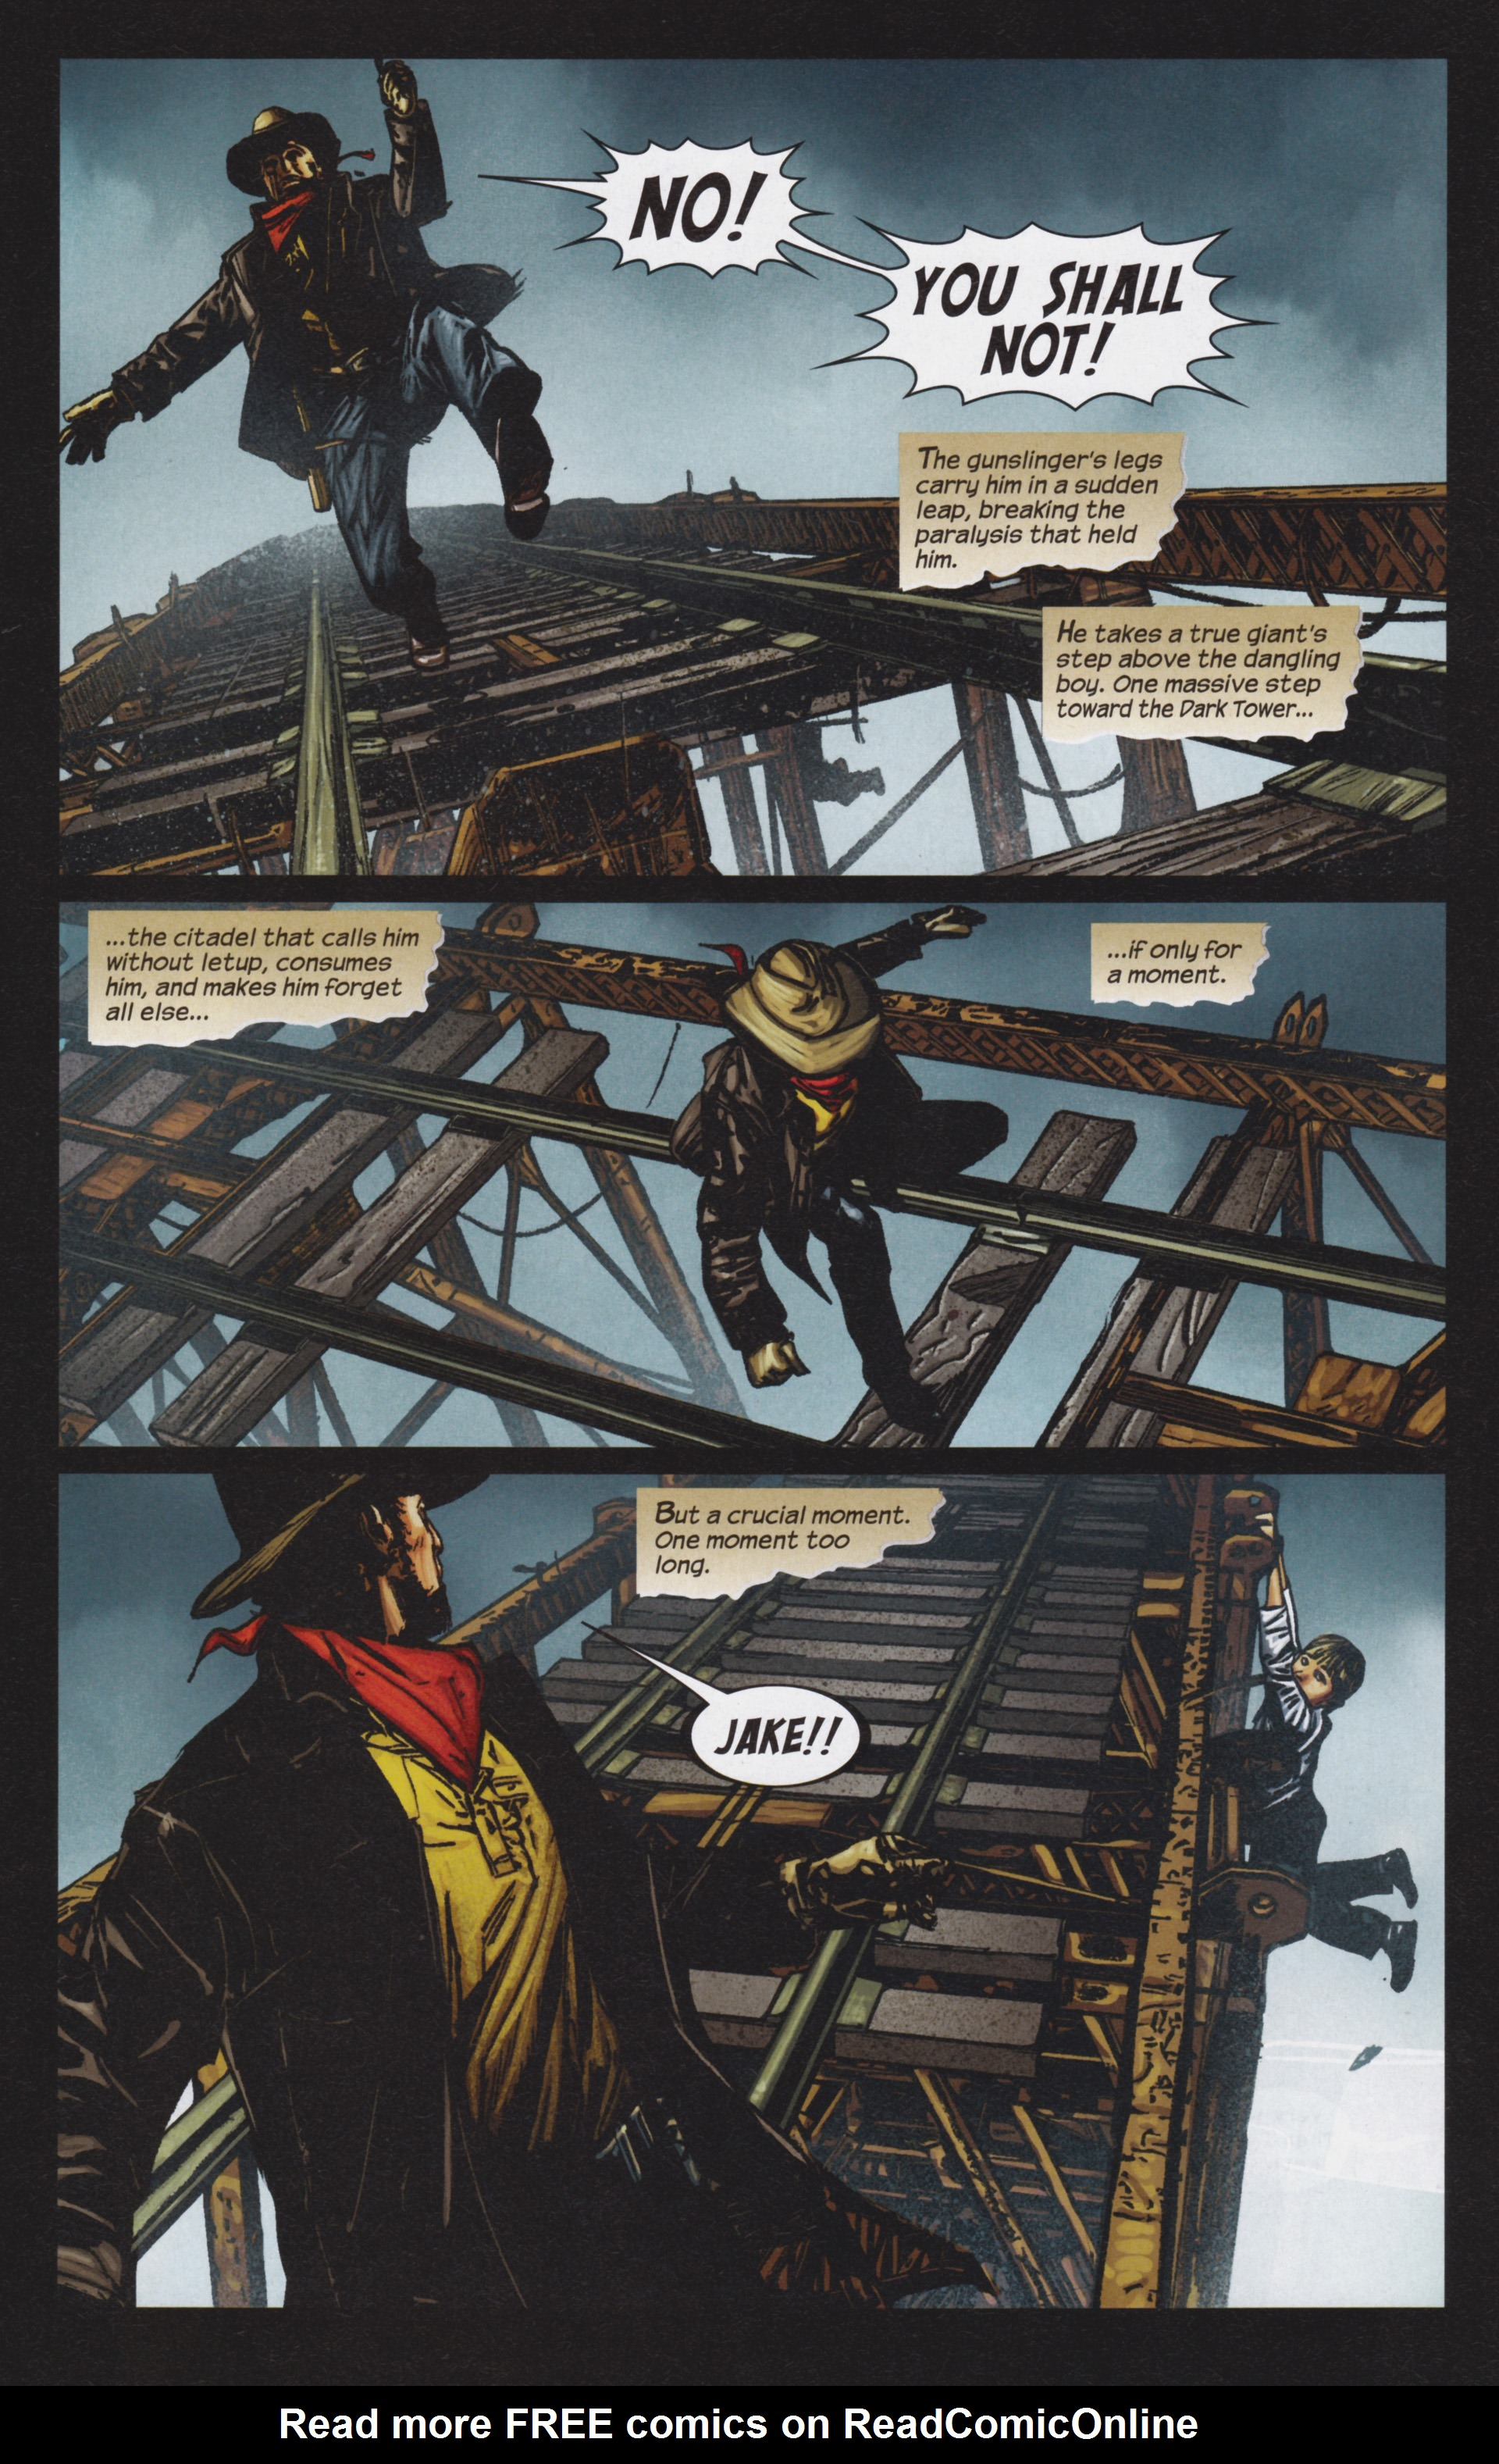 Read online Dark Tower: The Gunslinger - The Man in Black comic -  Issue #4 - 23